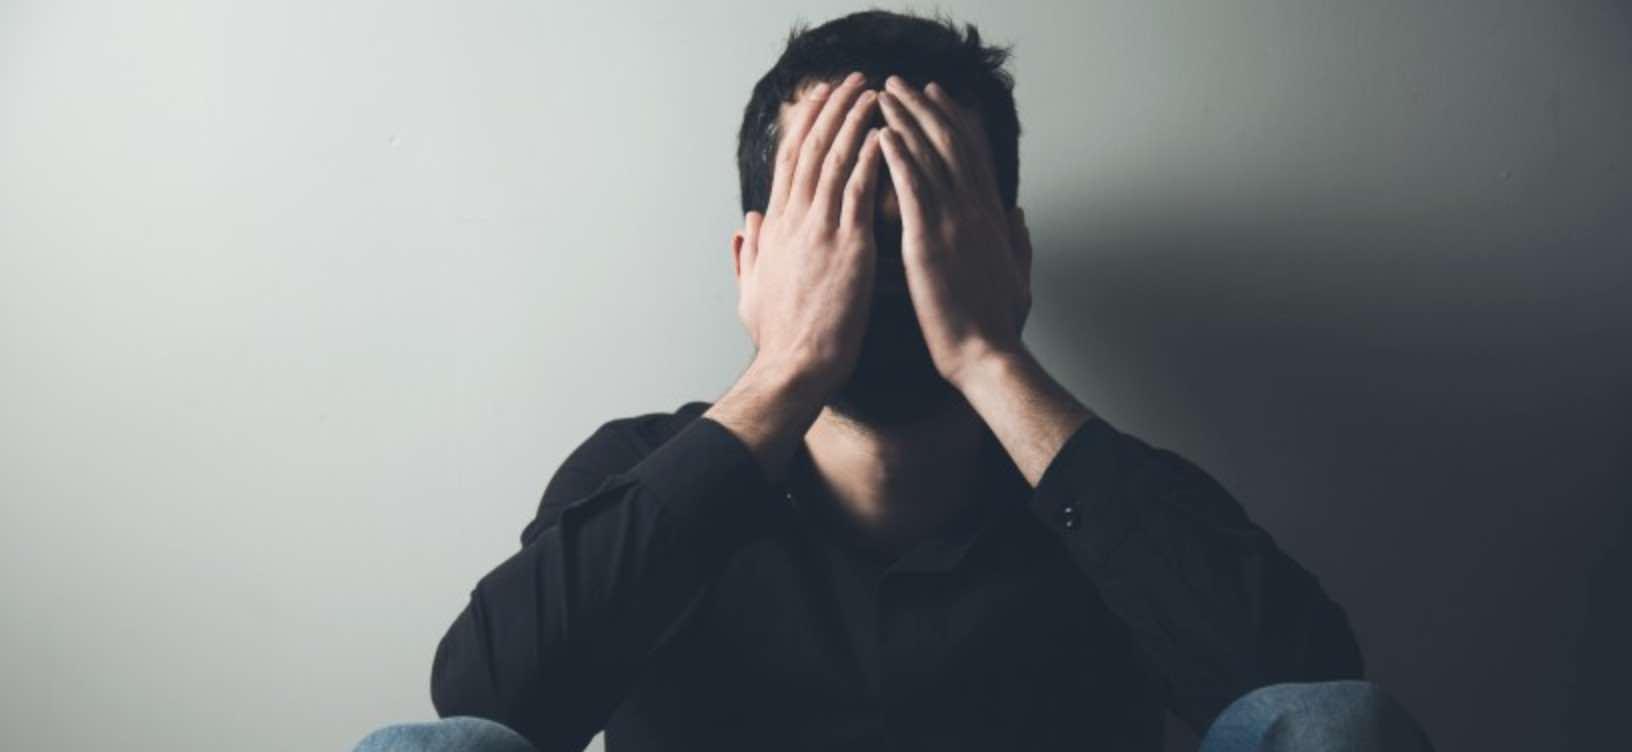 Mengenali Penyebab Depresi